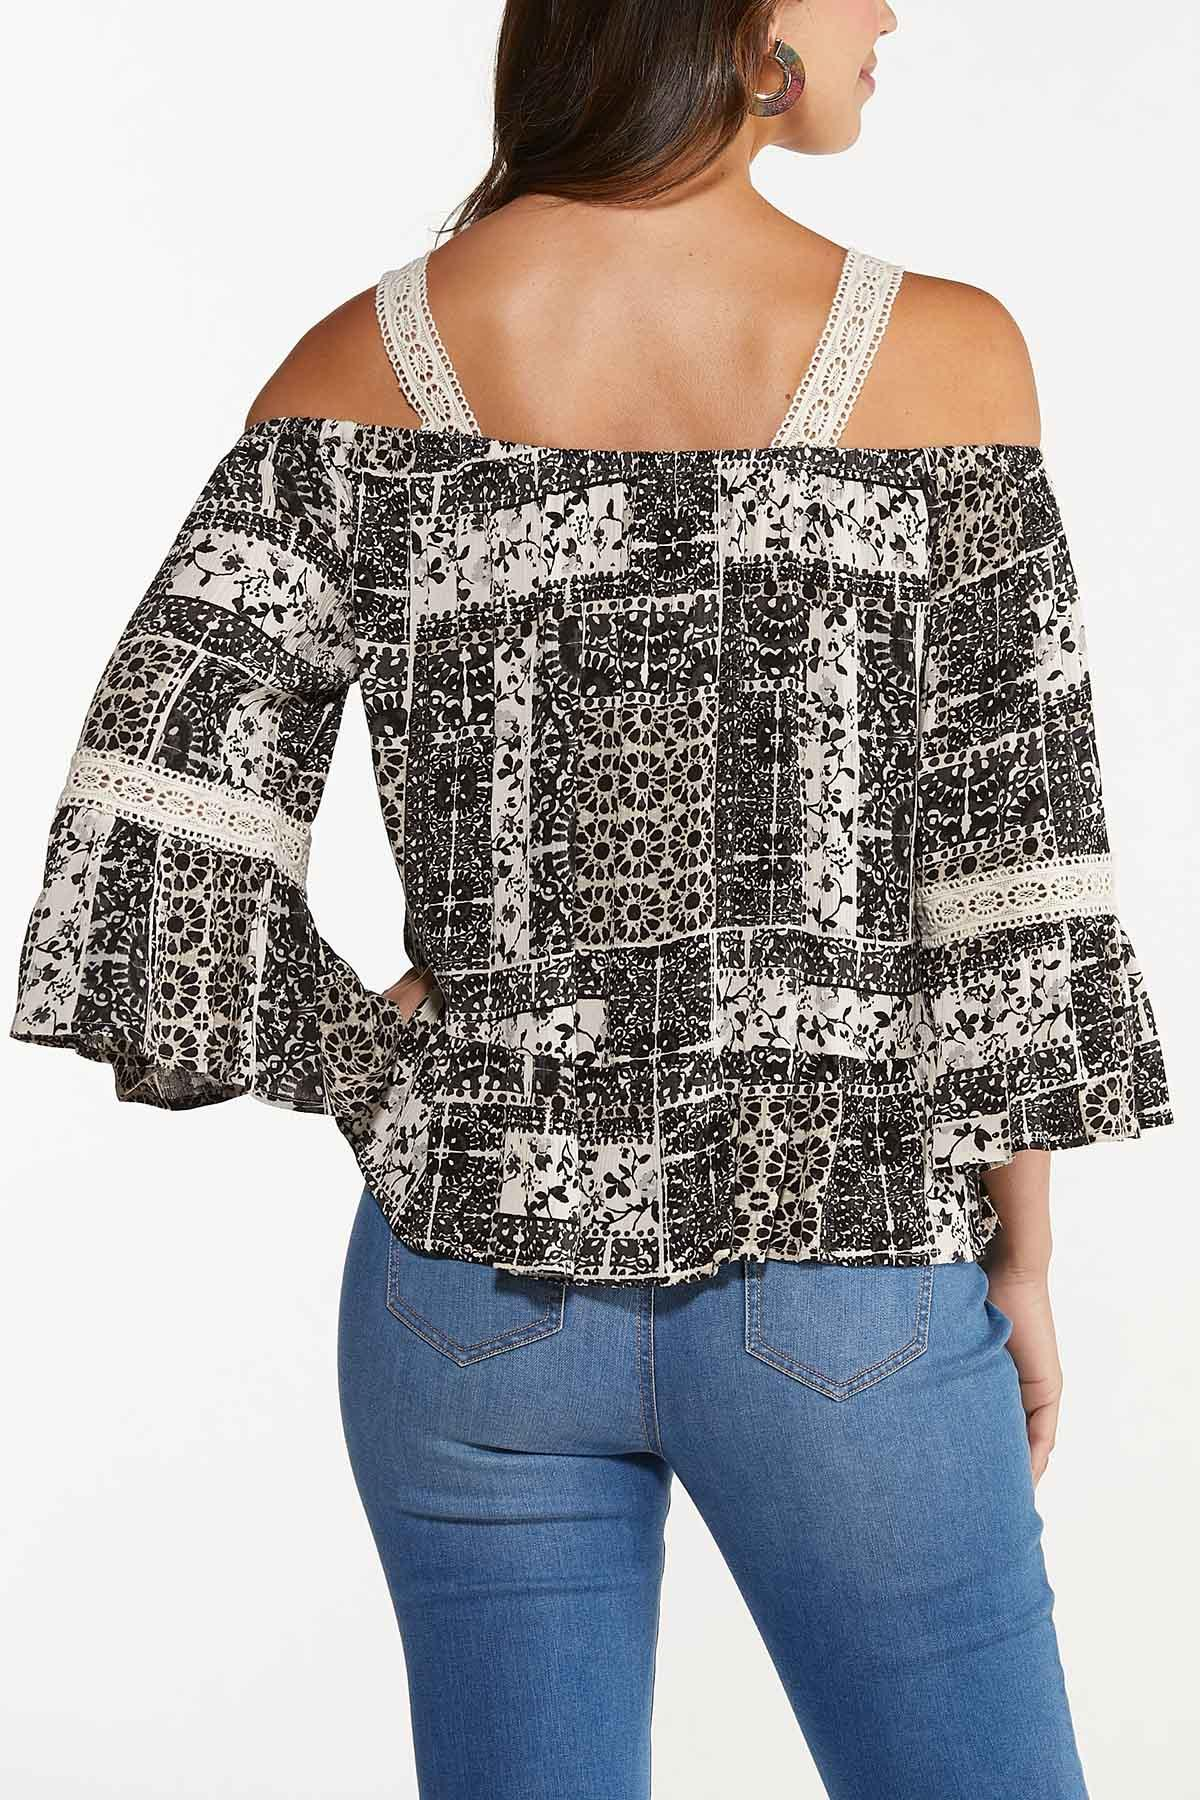 Plus Size Crochet Trim Poet Top (Item #44646710)